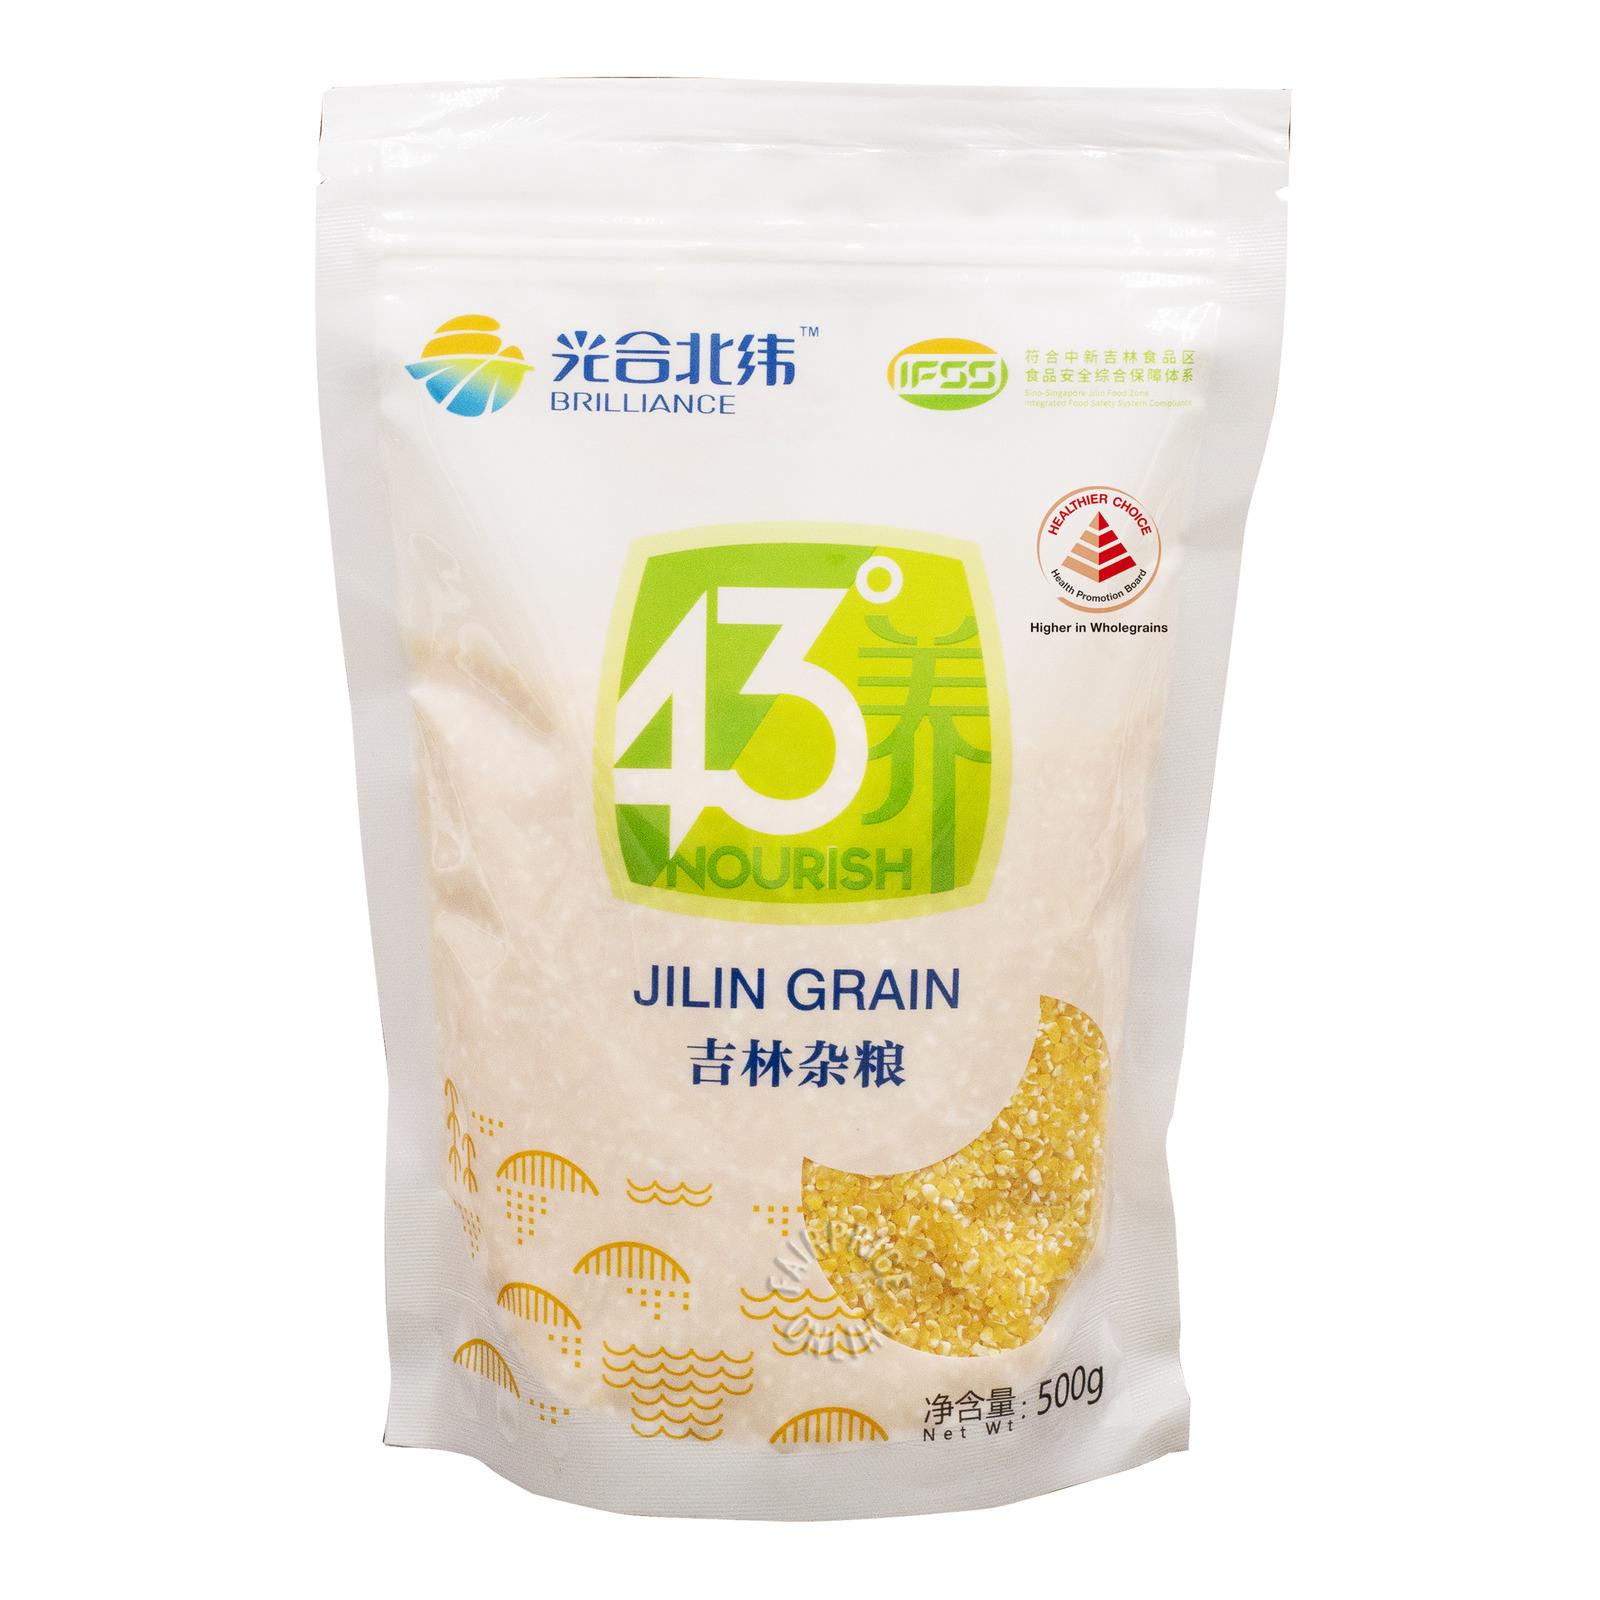 Brilliance 43° Nourish Series - Cut Maize